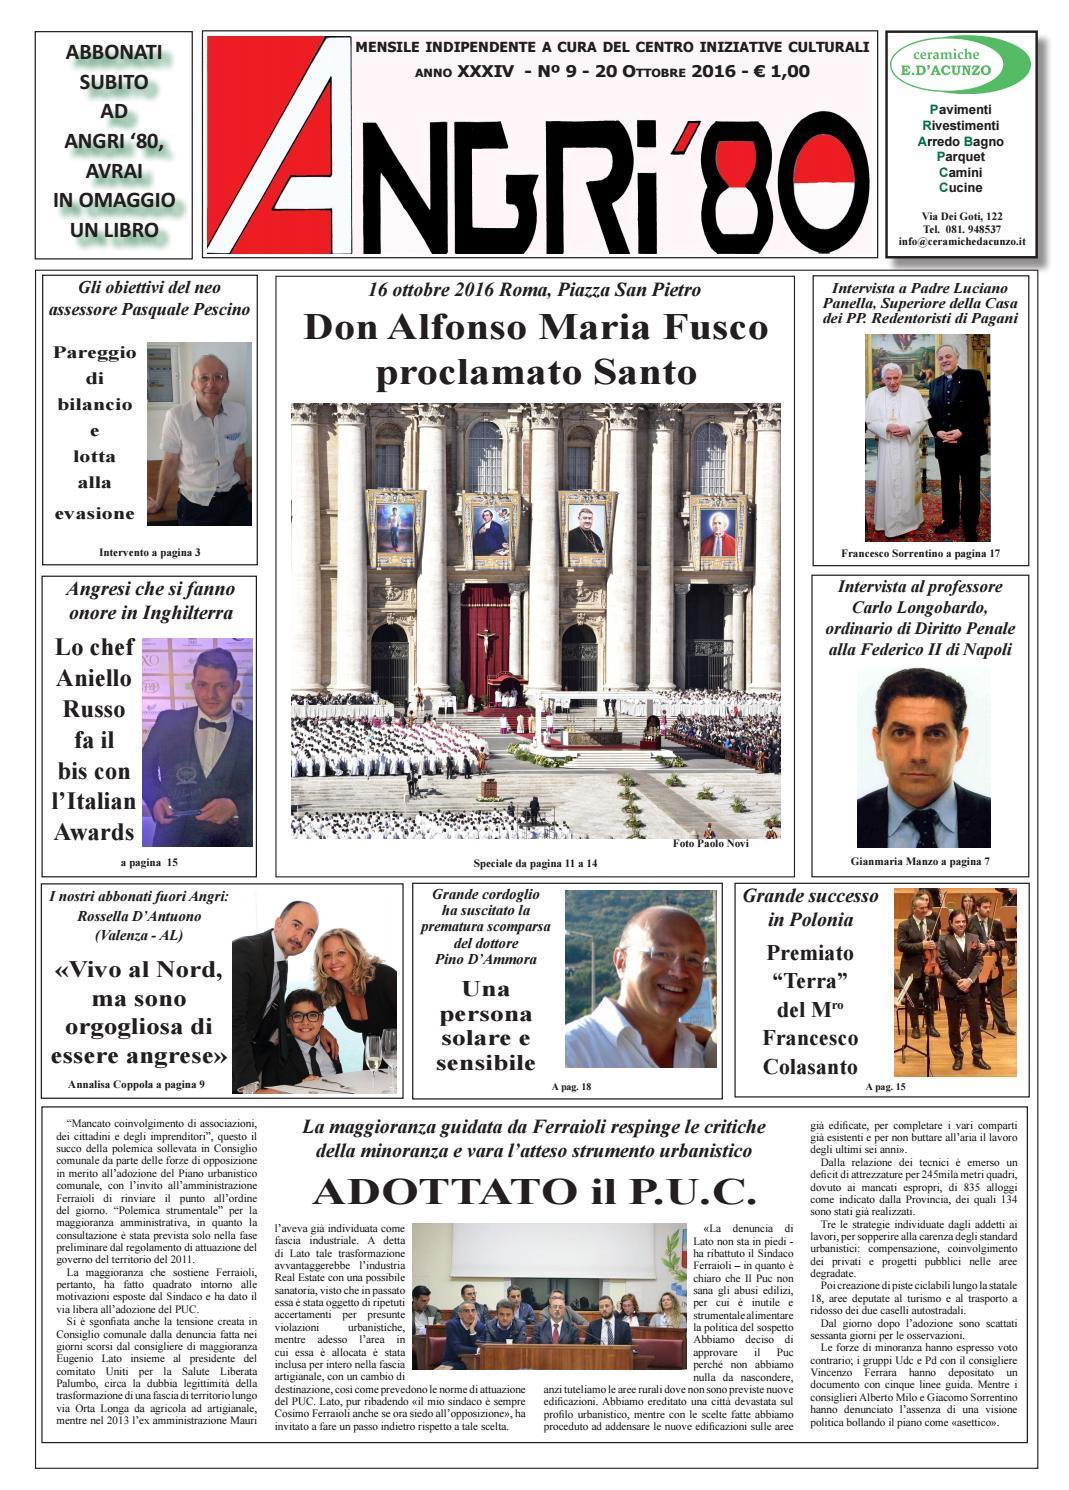 angri 80 ott 2016rettificato by lombardi antonio - issuu - Arredo Bagno Angri